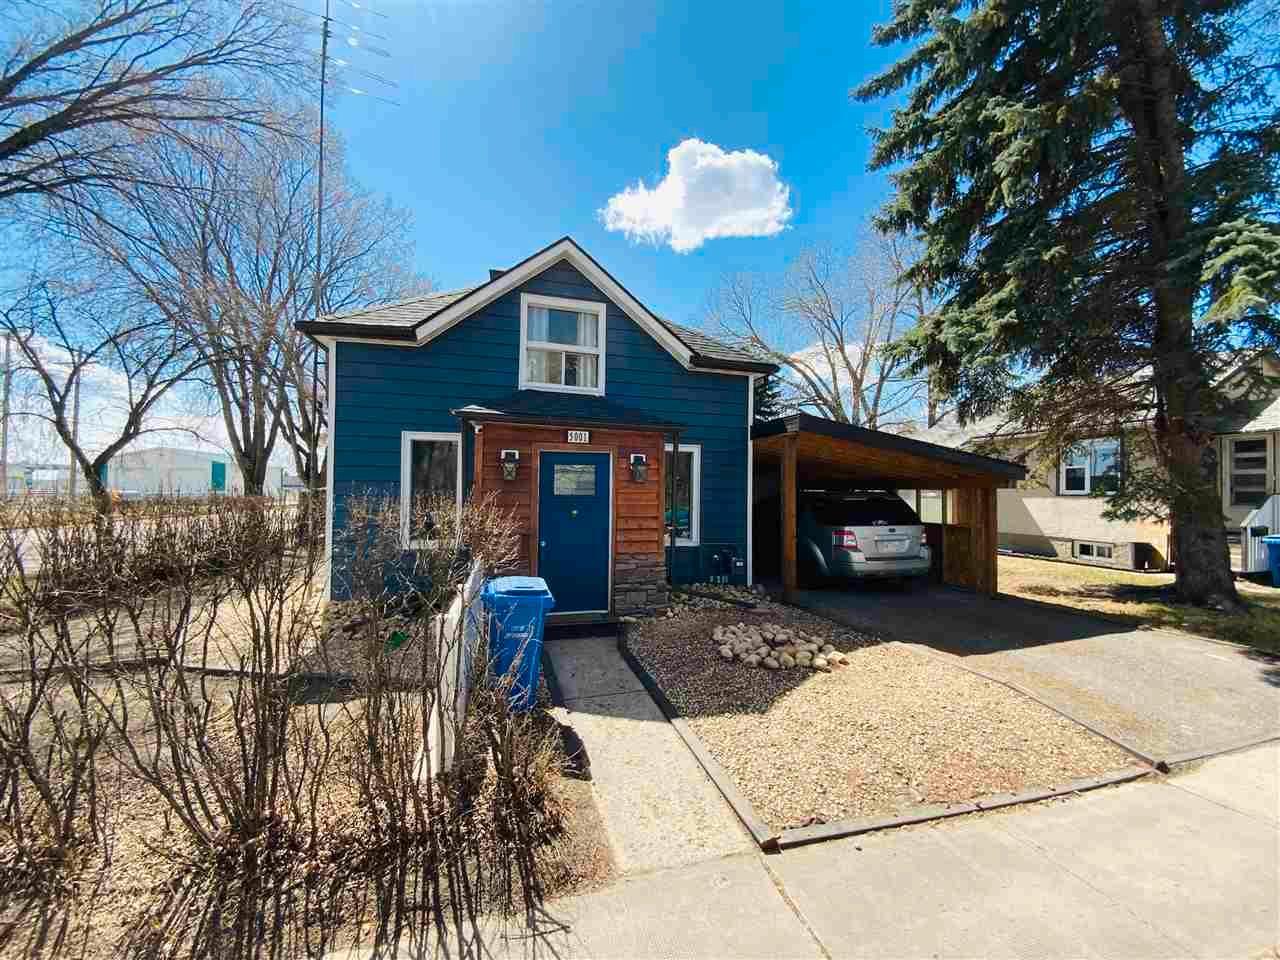 Main Photo: 5001 45 Avenue: Wetaskiwin House for sale : MLS®# E4234003